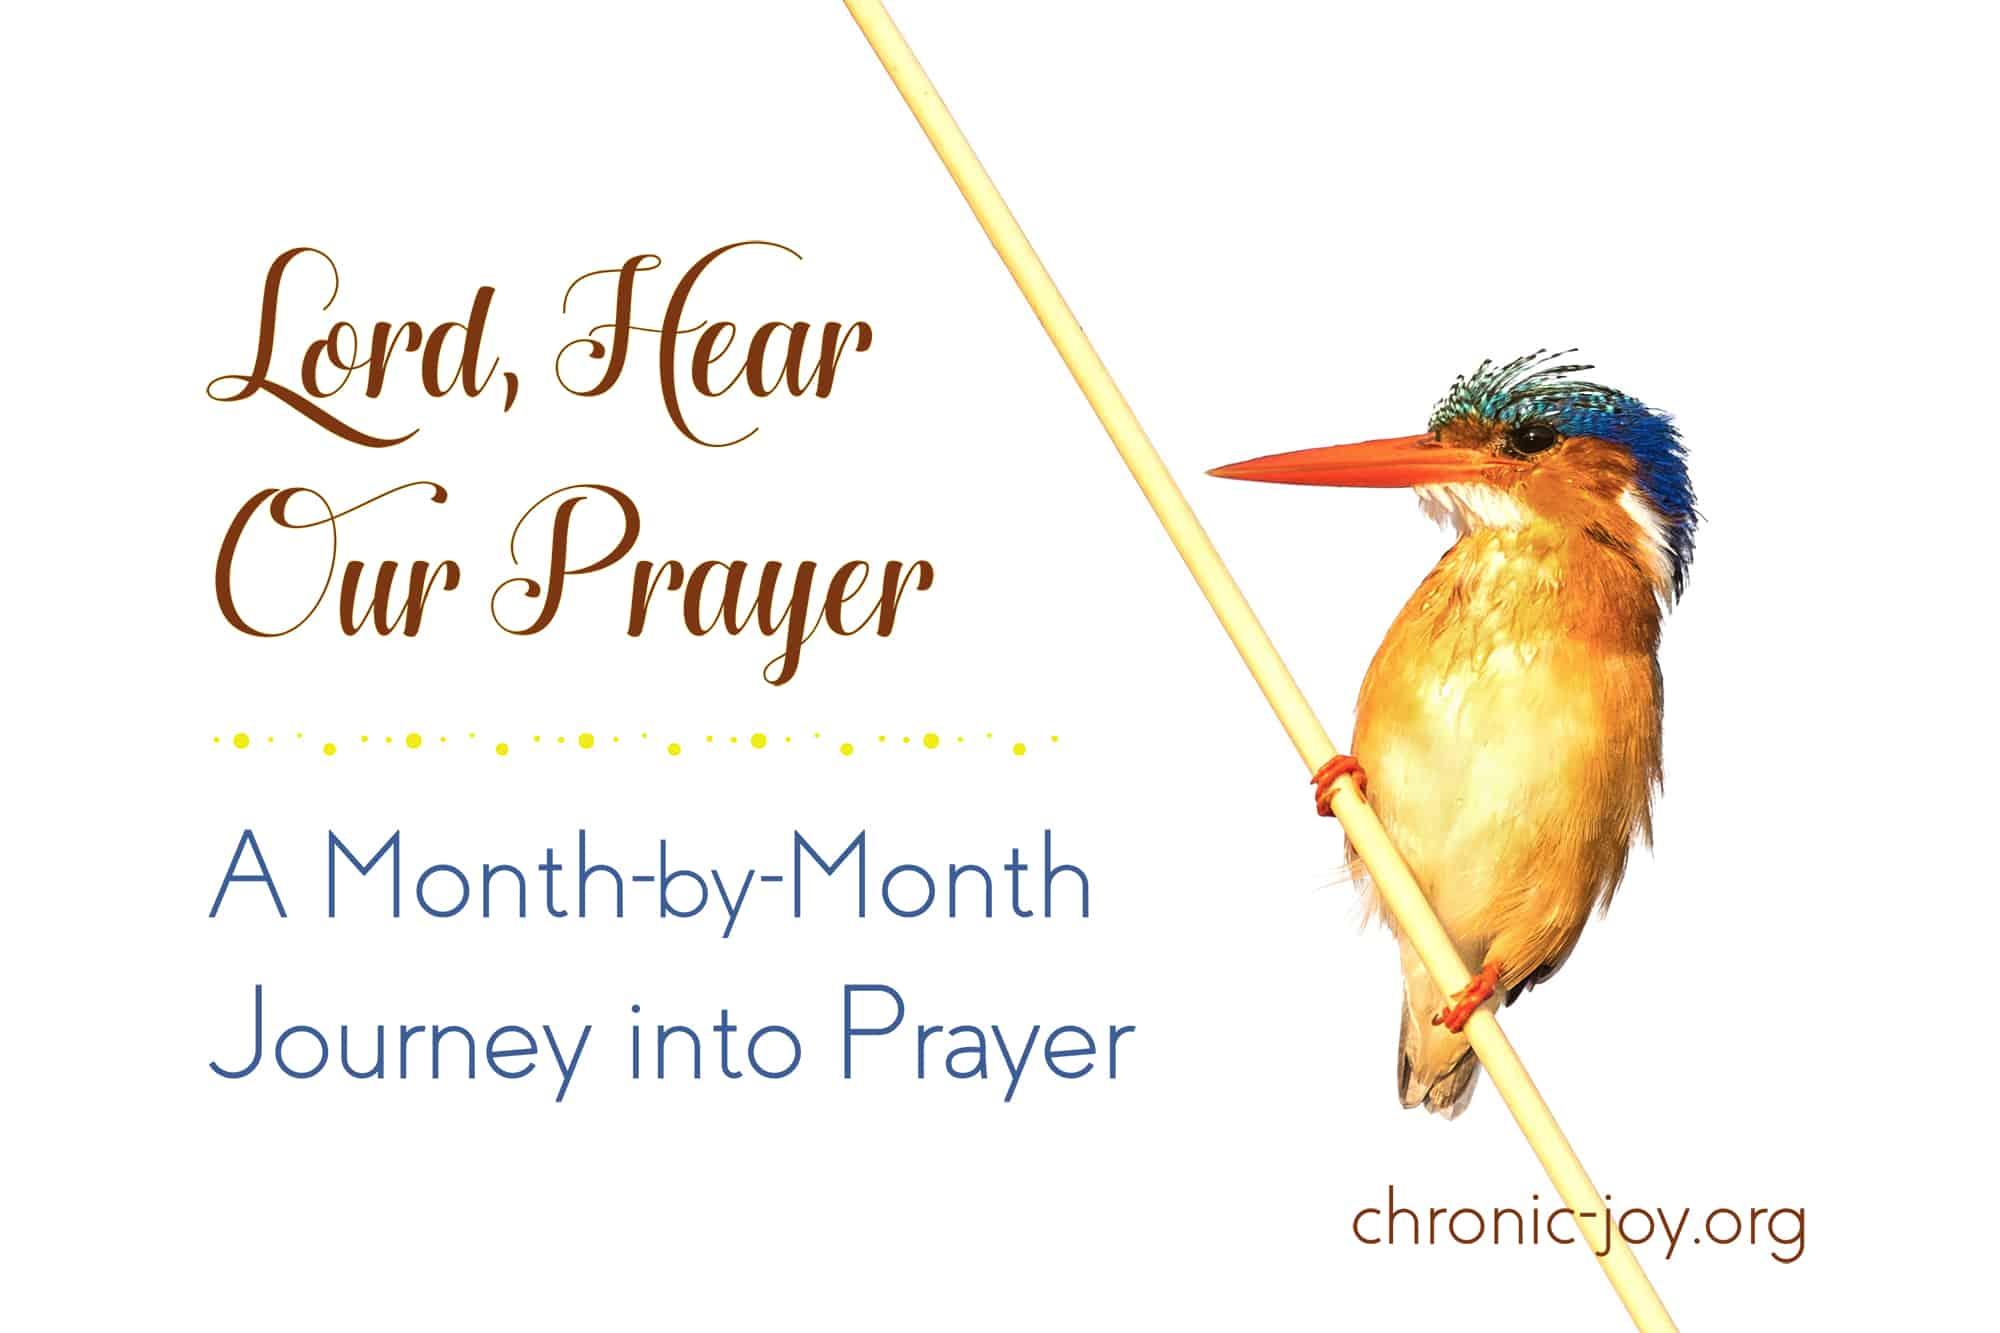 Journey into Prayer